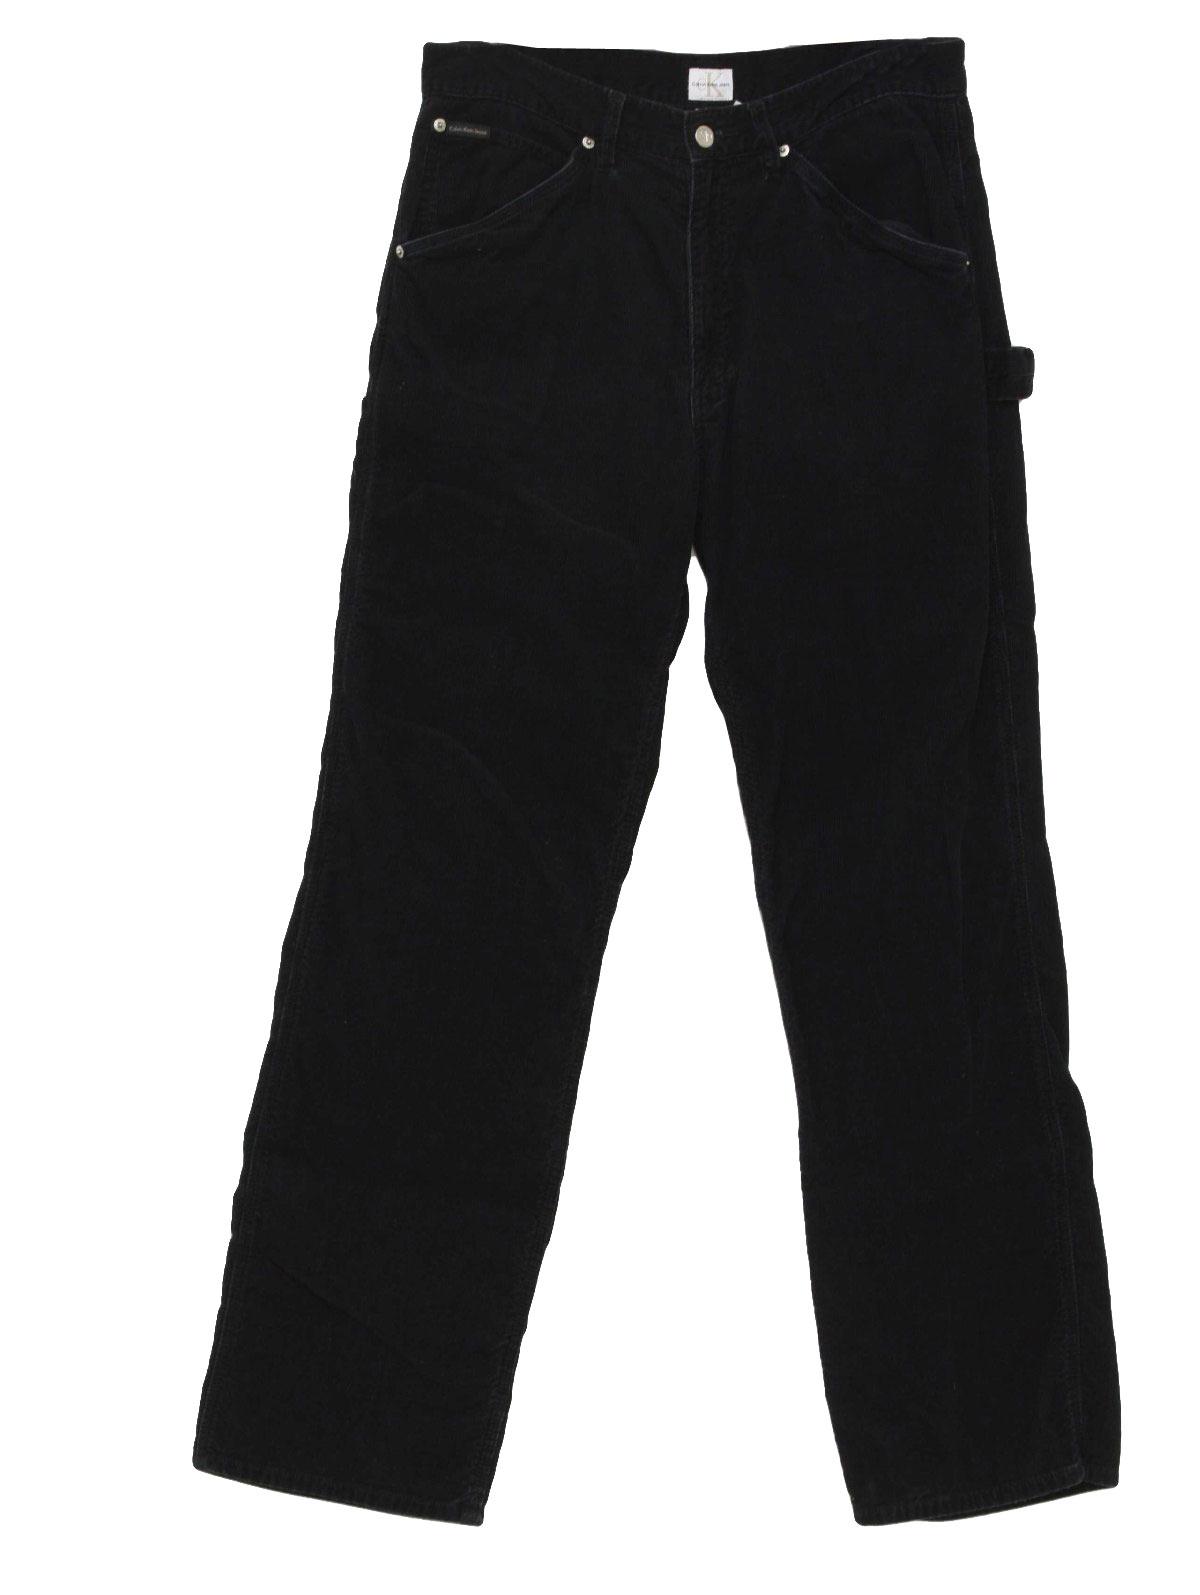 1990s Calvin Klein Jeans, designer Pants: 90s -Calvin Klein Jeans ...